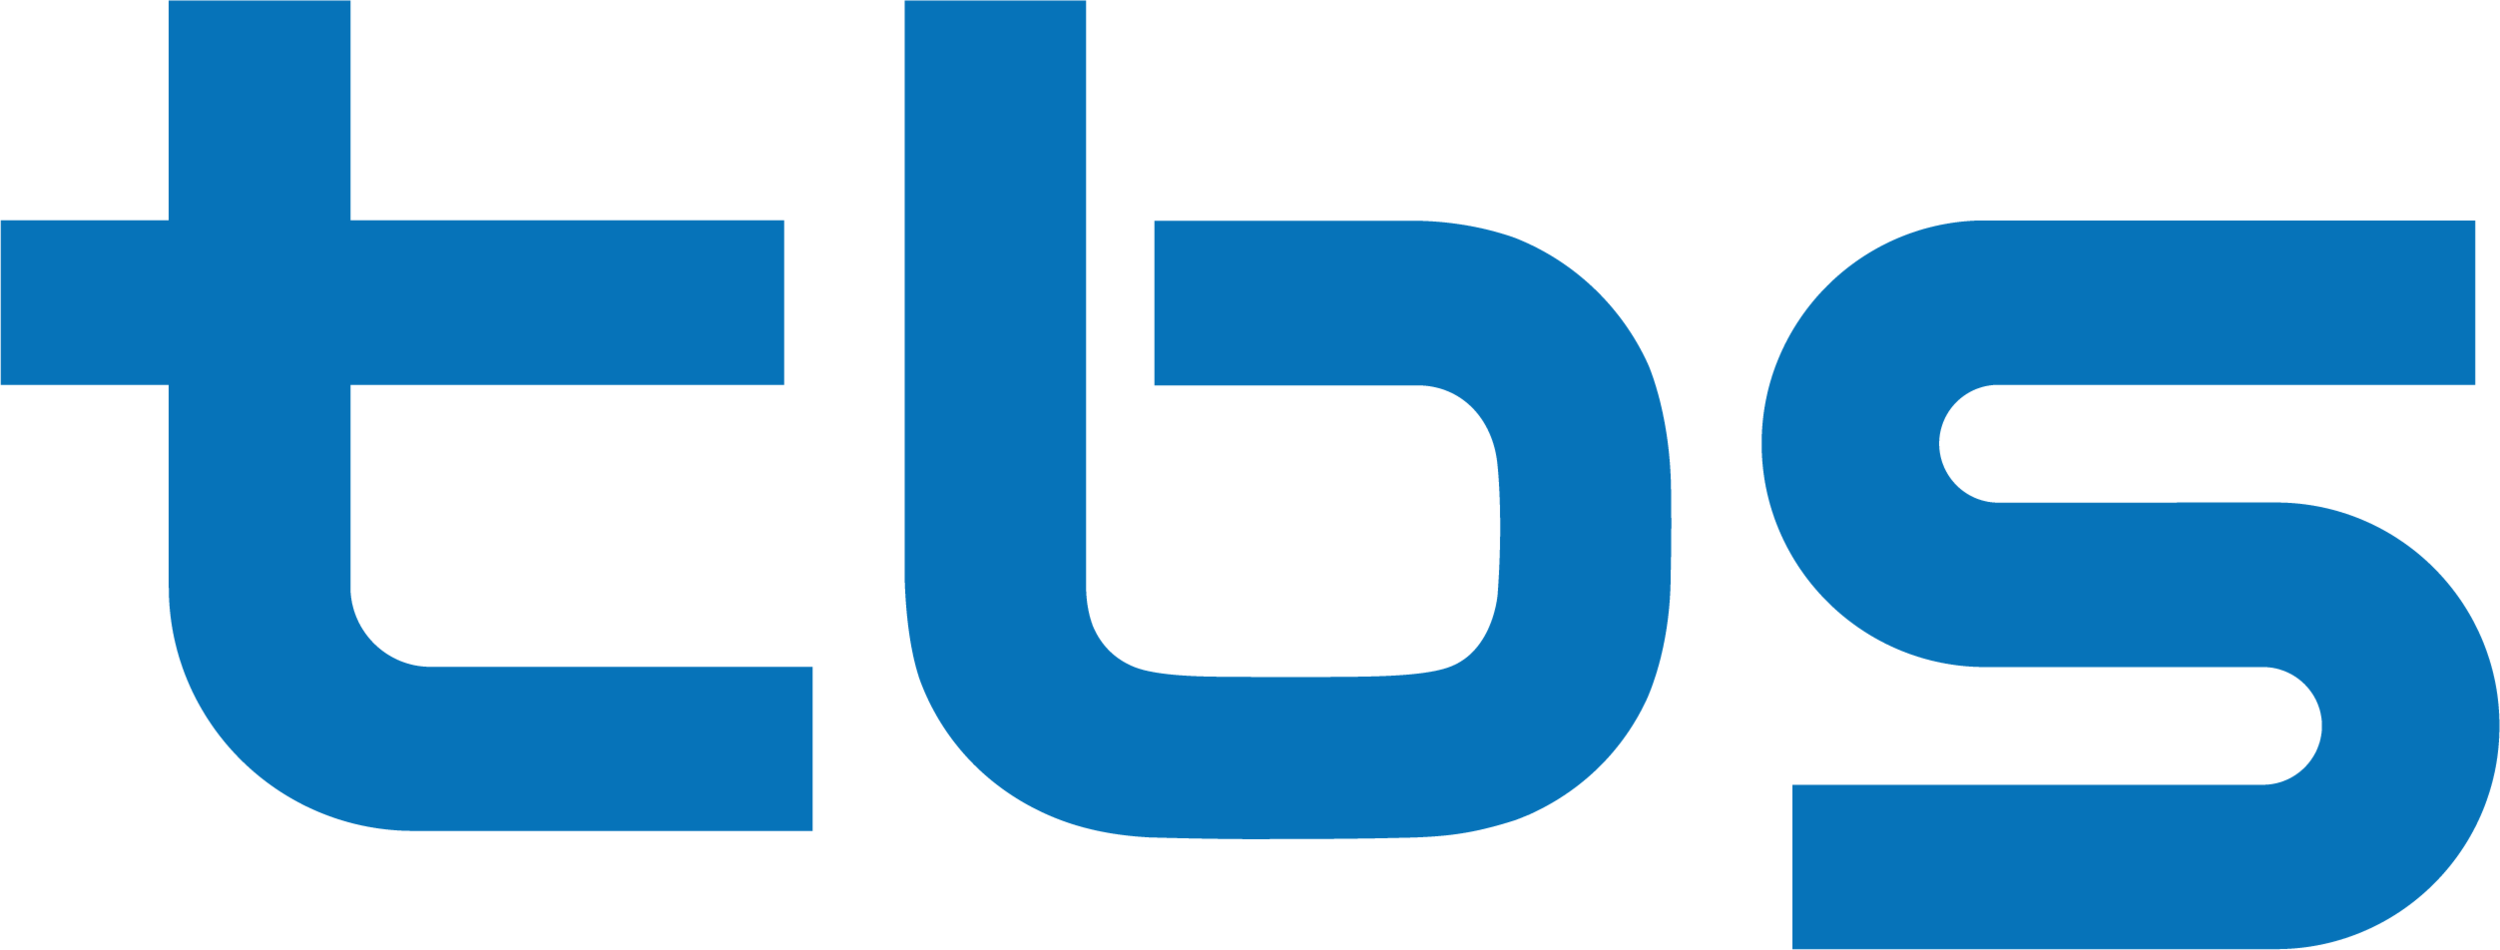 TBS eFM.jpeg